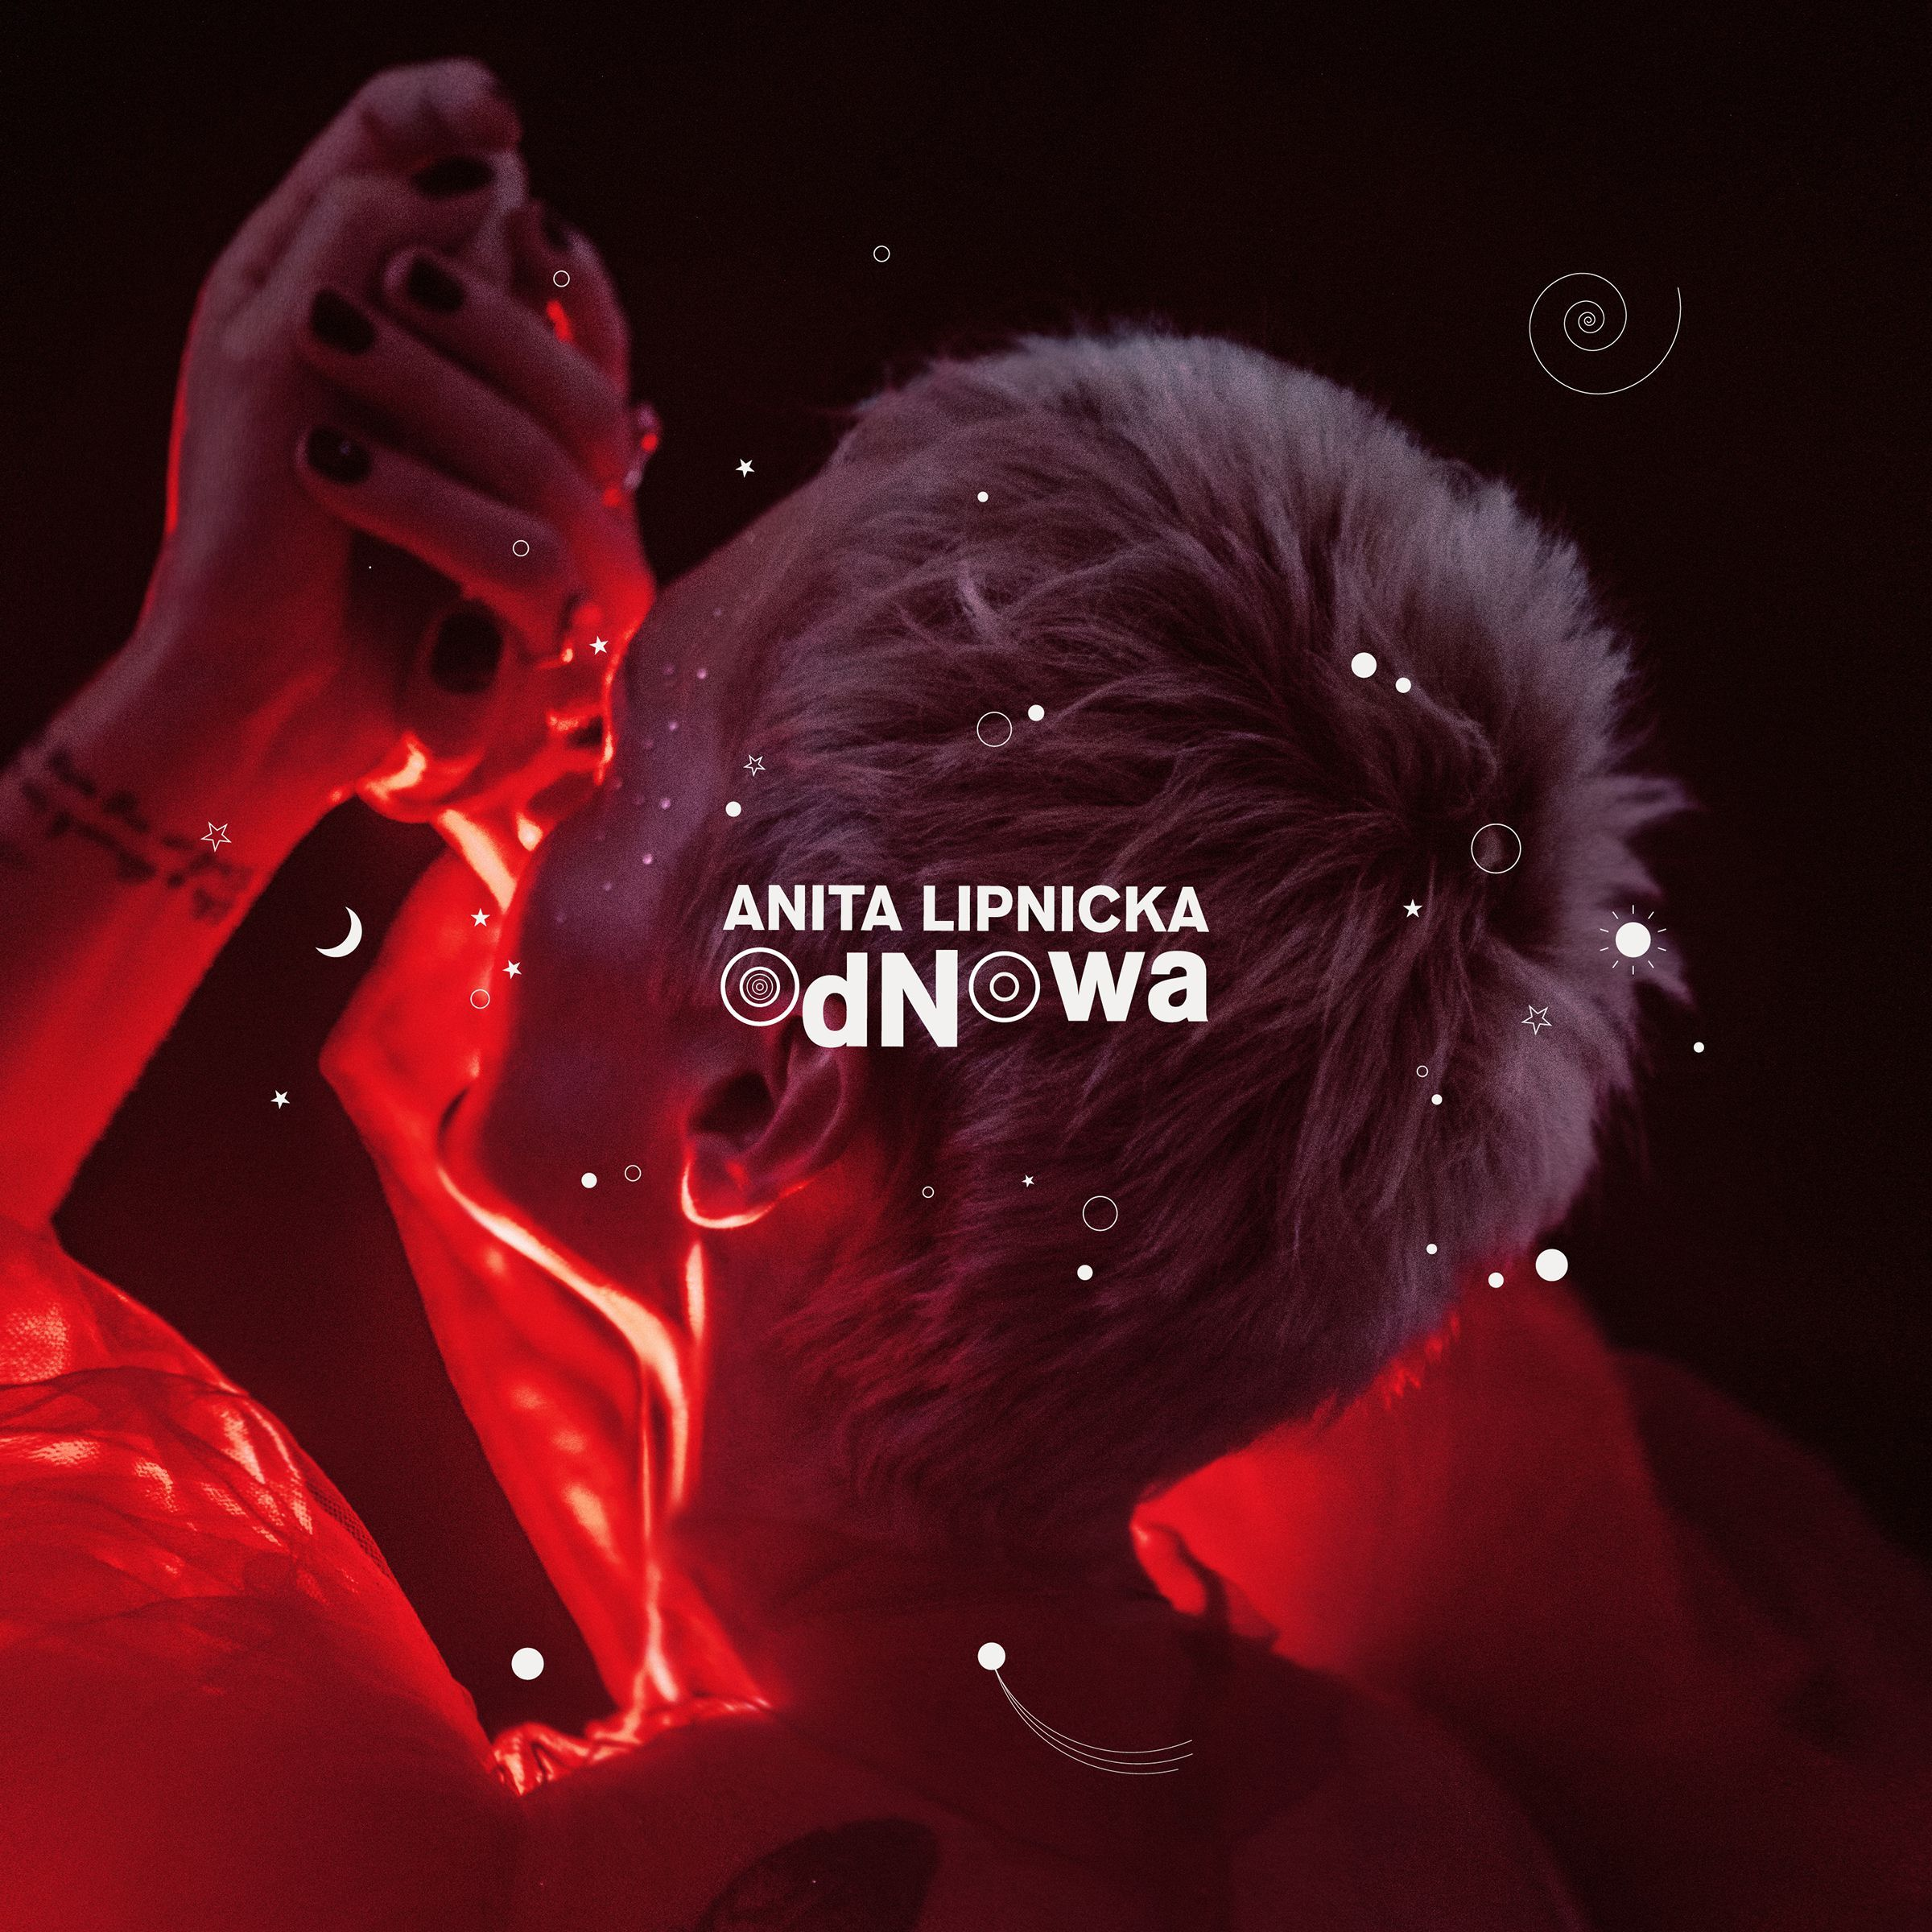 Lipnicka Anita – OdNowa